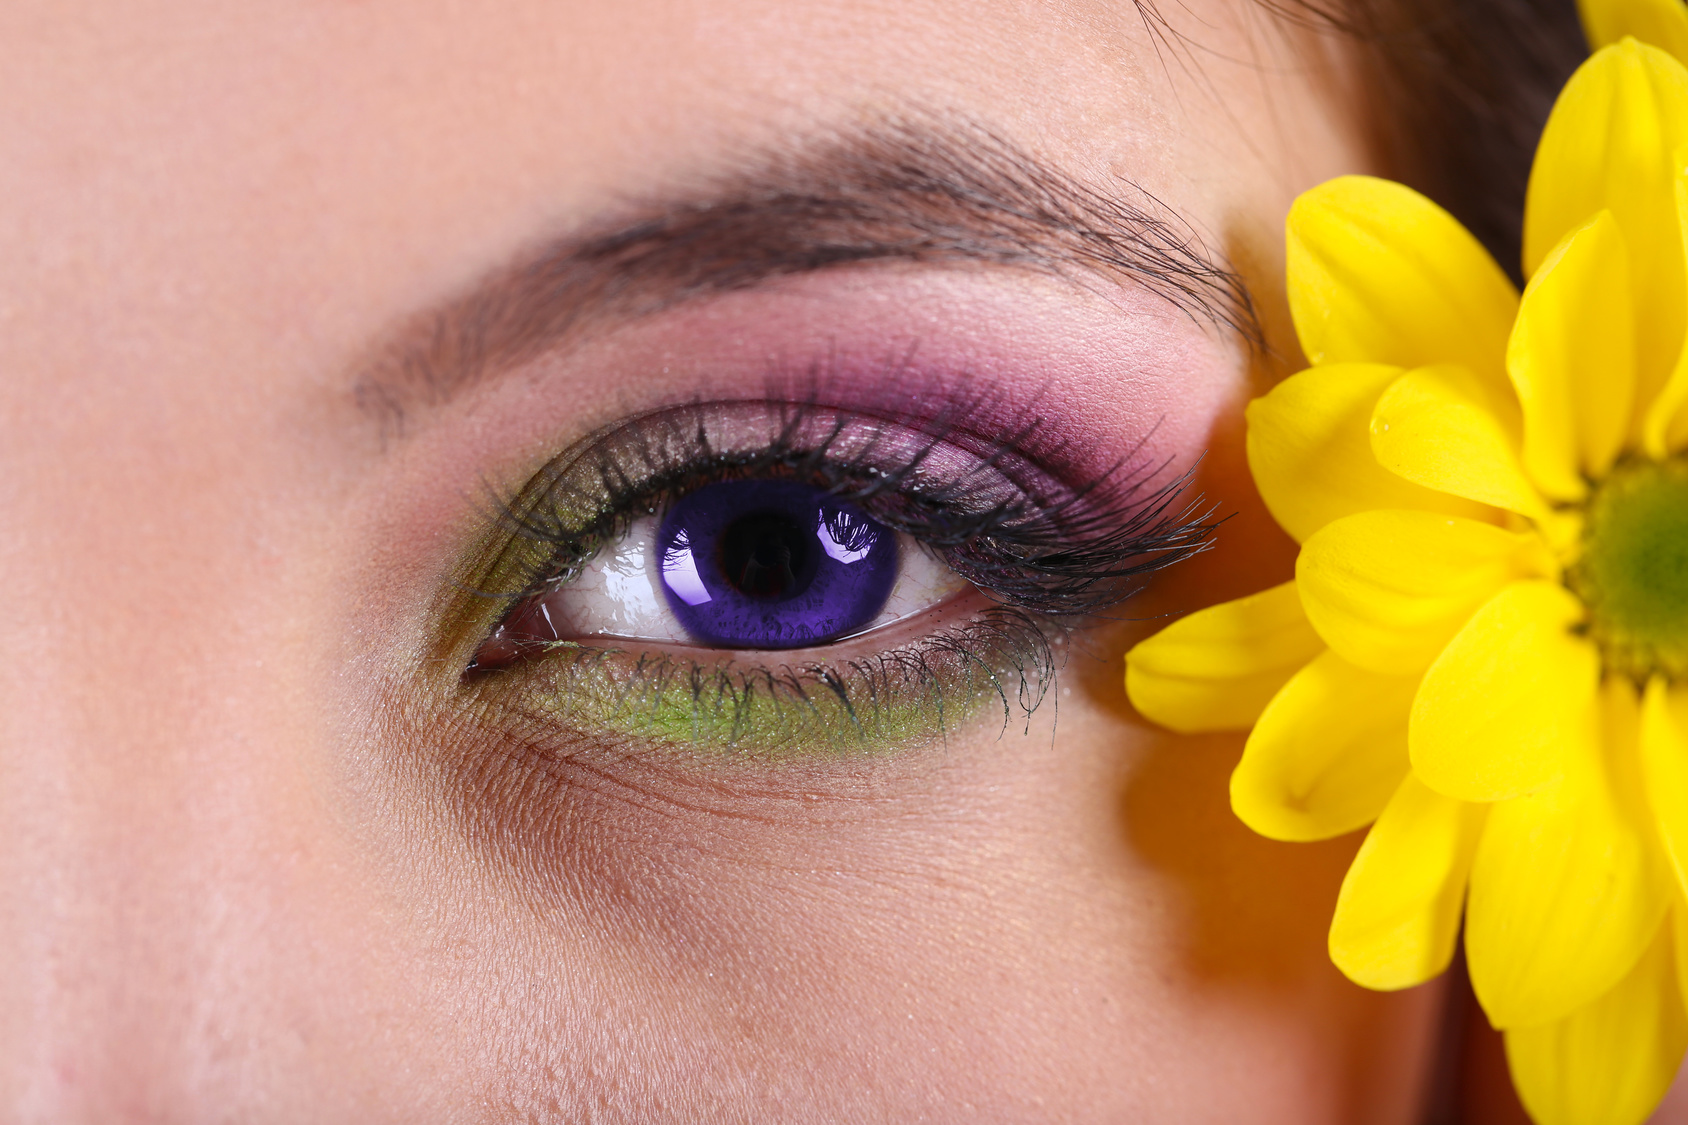 Castiga un set de lentile de contact ultraviolet, o alegere in tendinte!